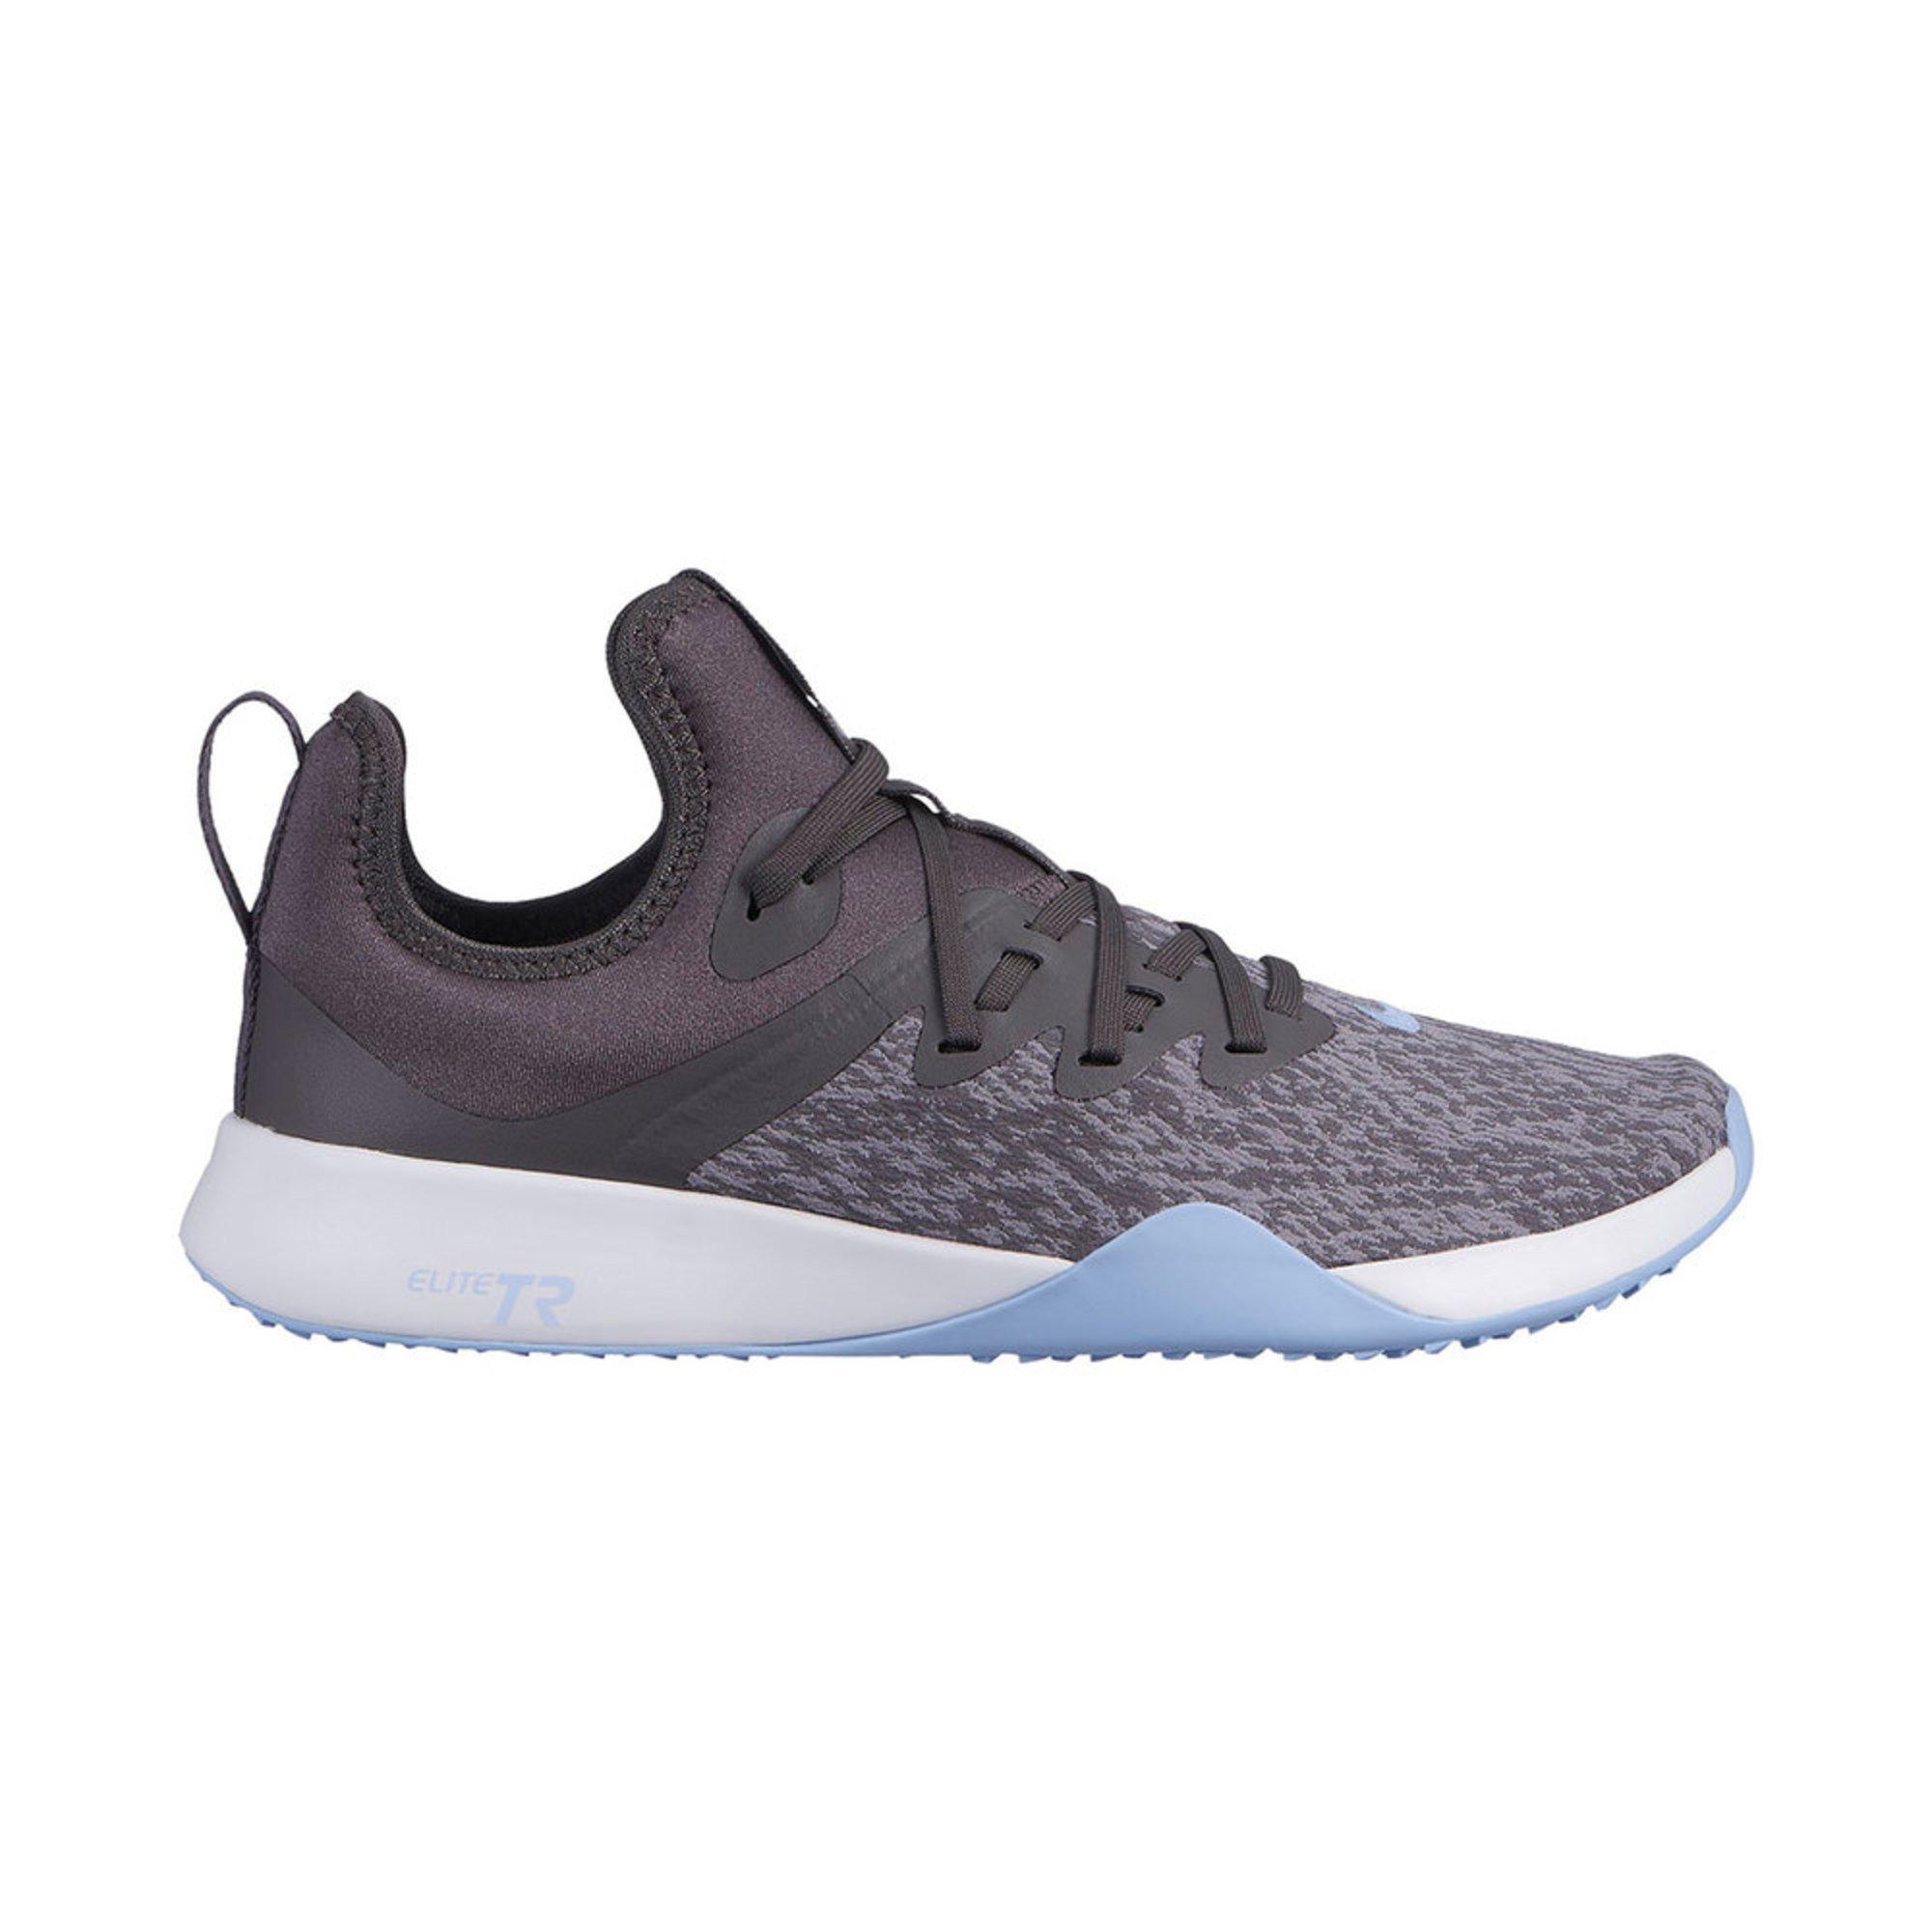 new styles 4da9c 972d0 Nike. Nike Women s Foundation Elite TR Training Shoe